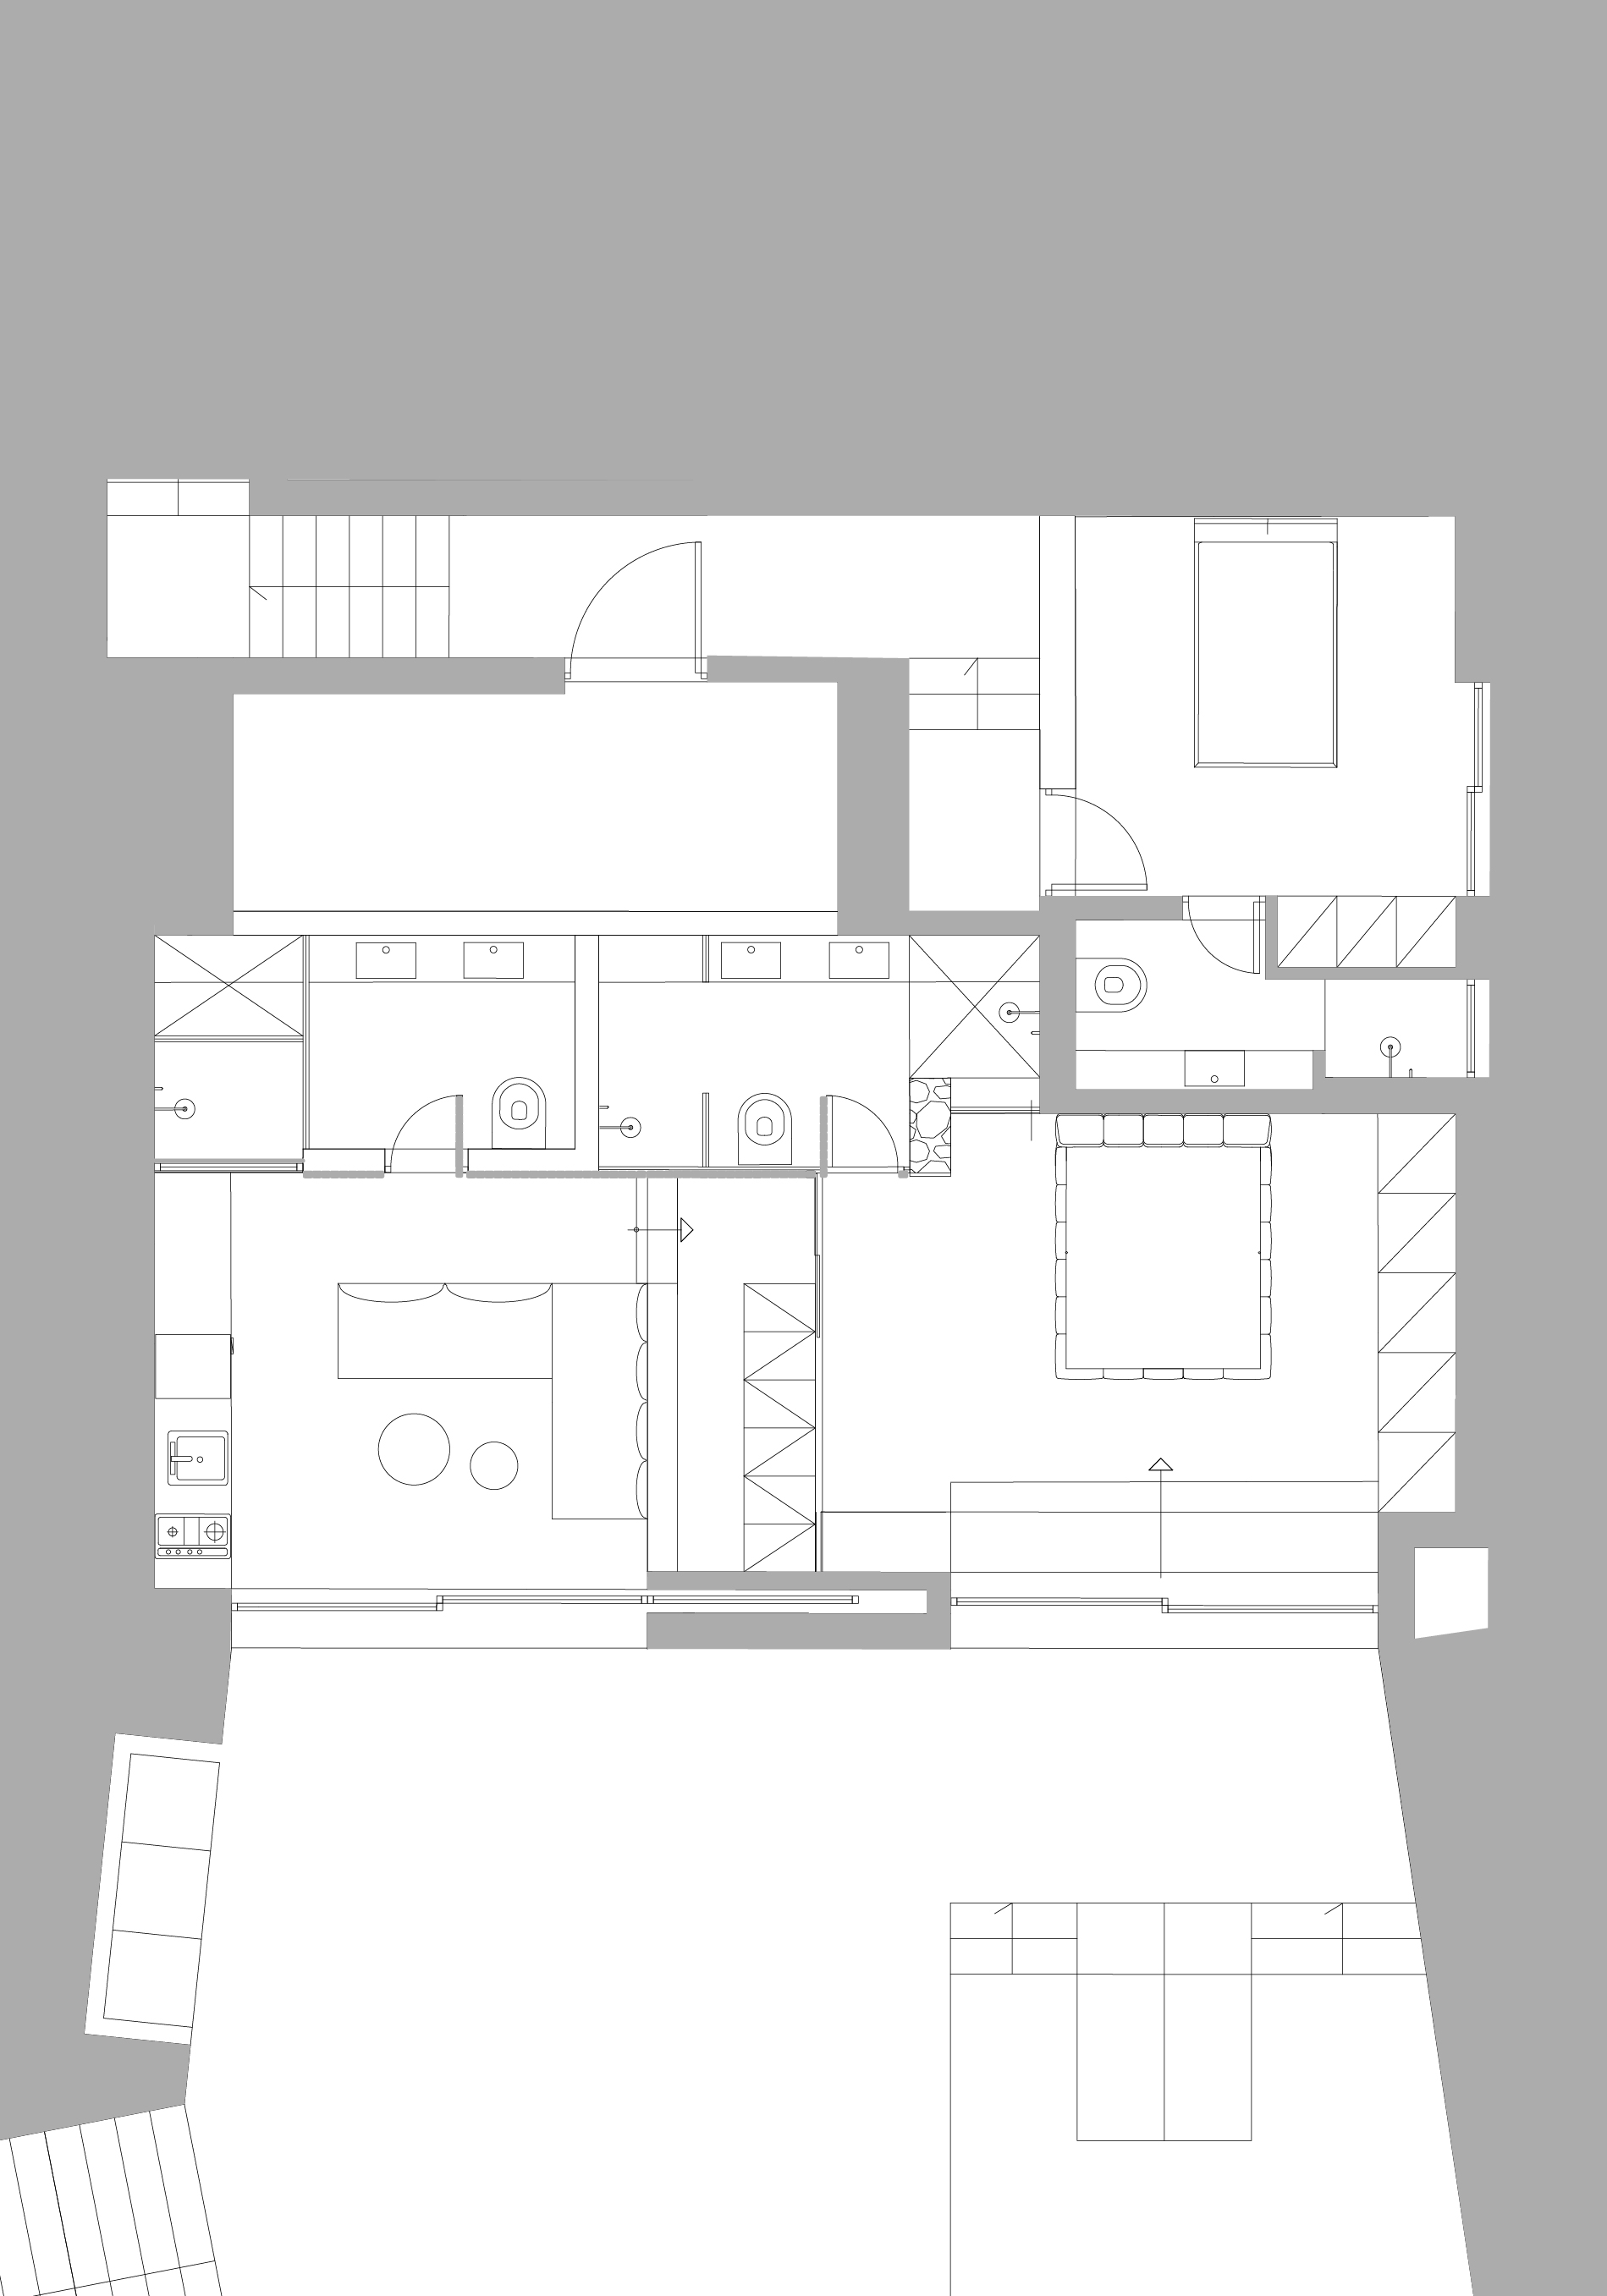 SUITES 5,6 & 7 - THE GUEST HOUSE